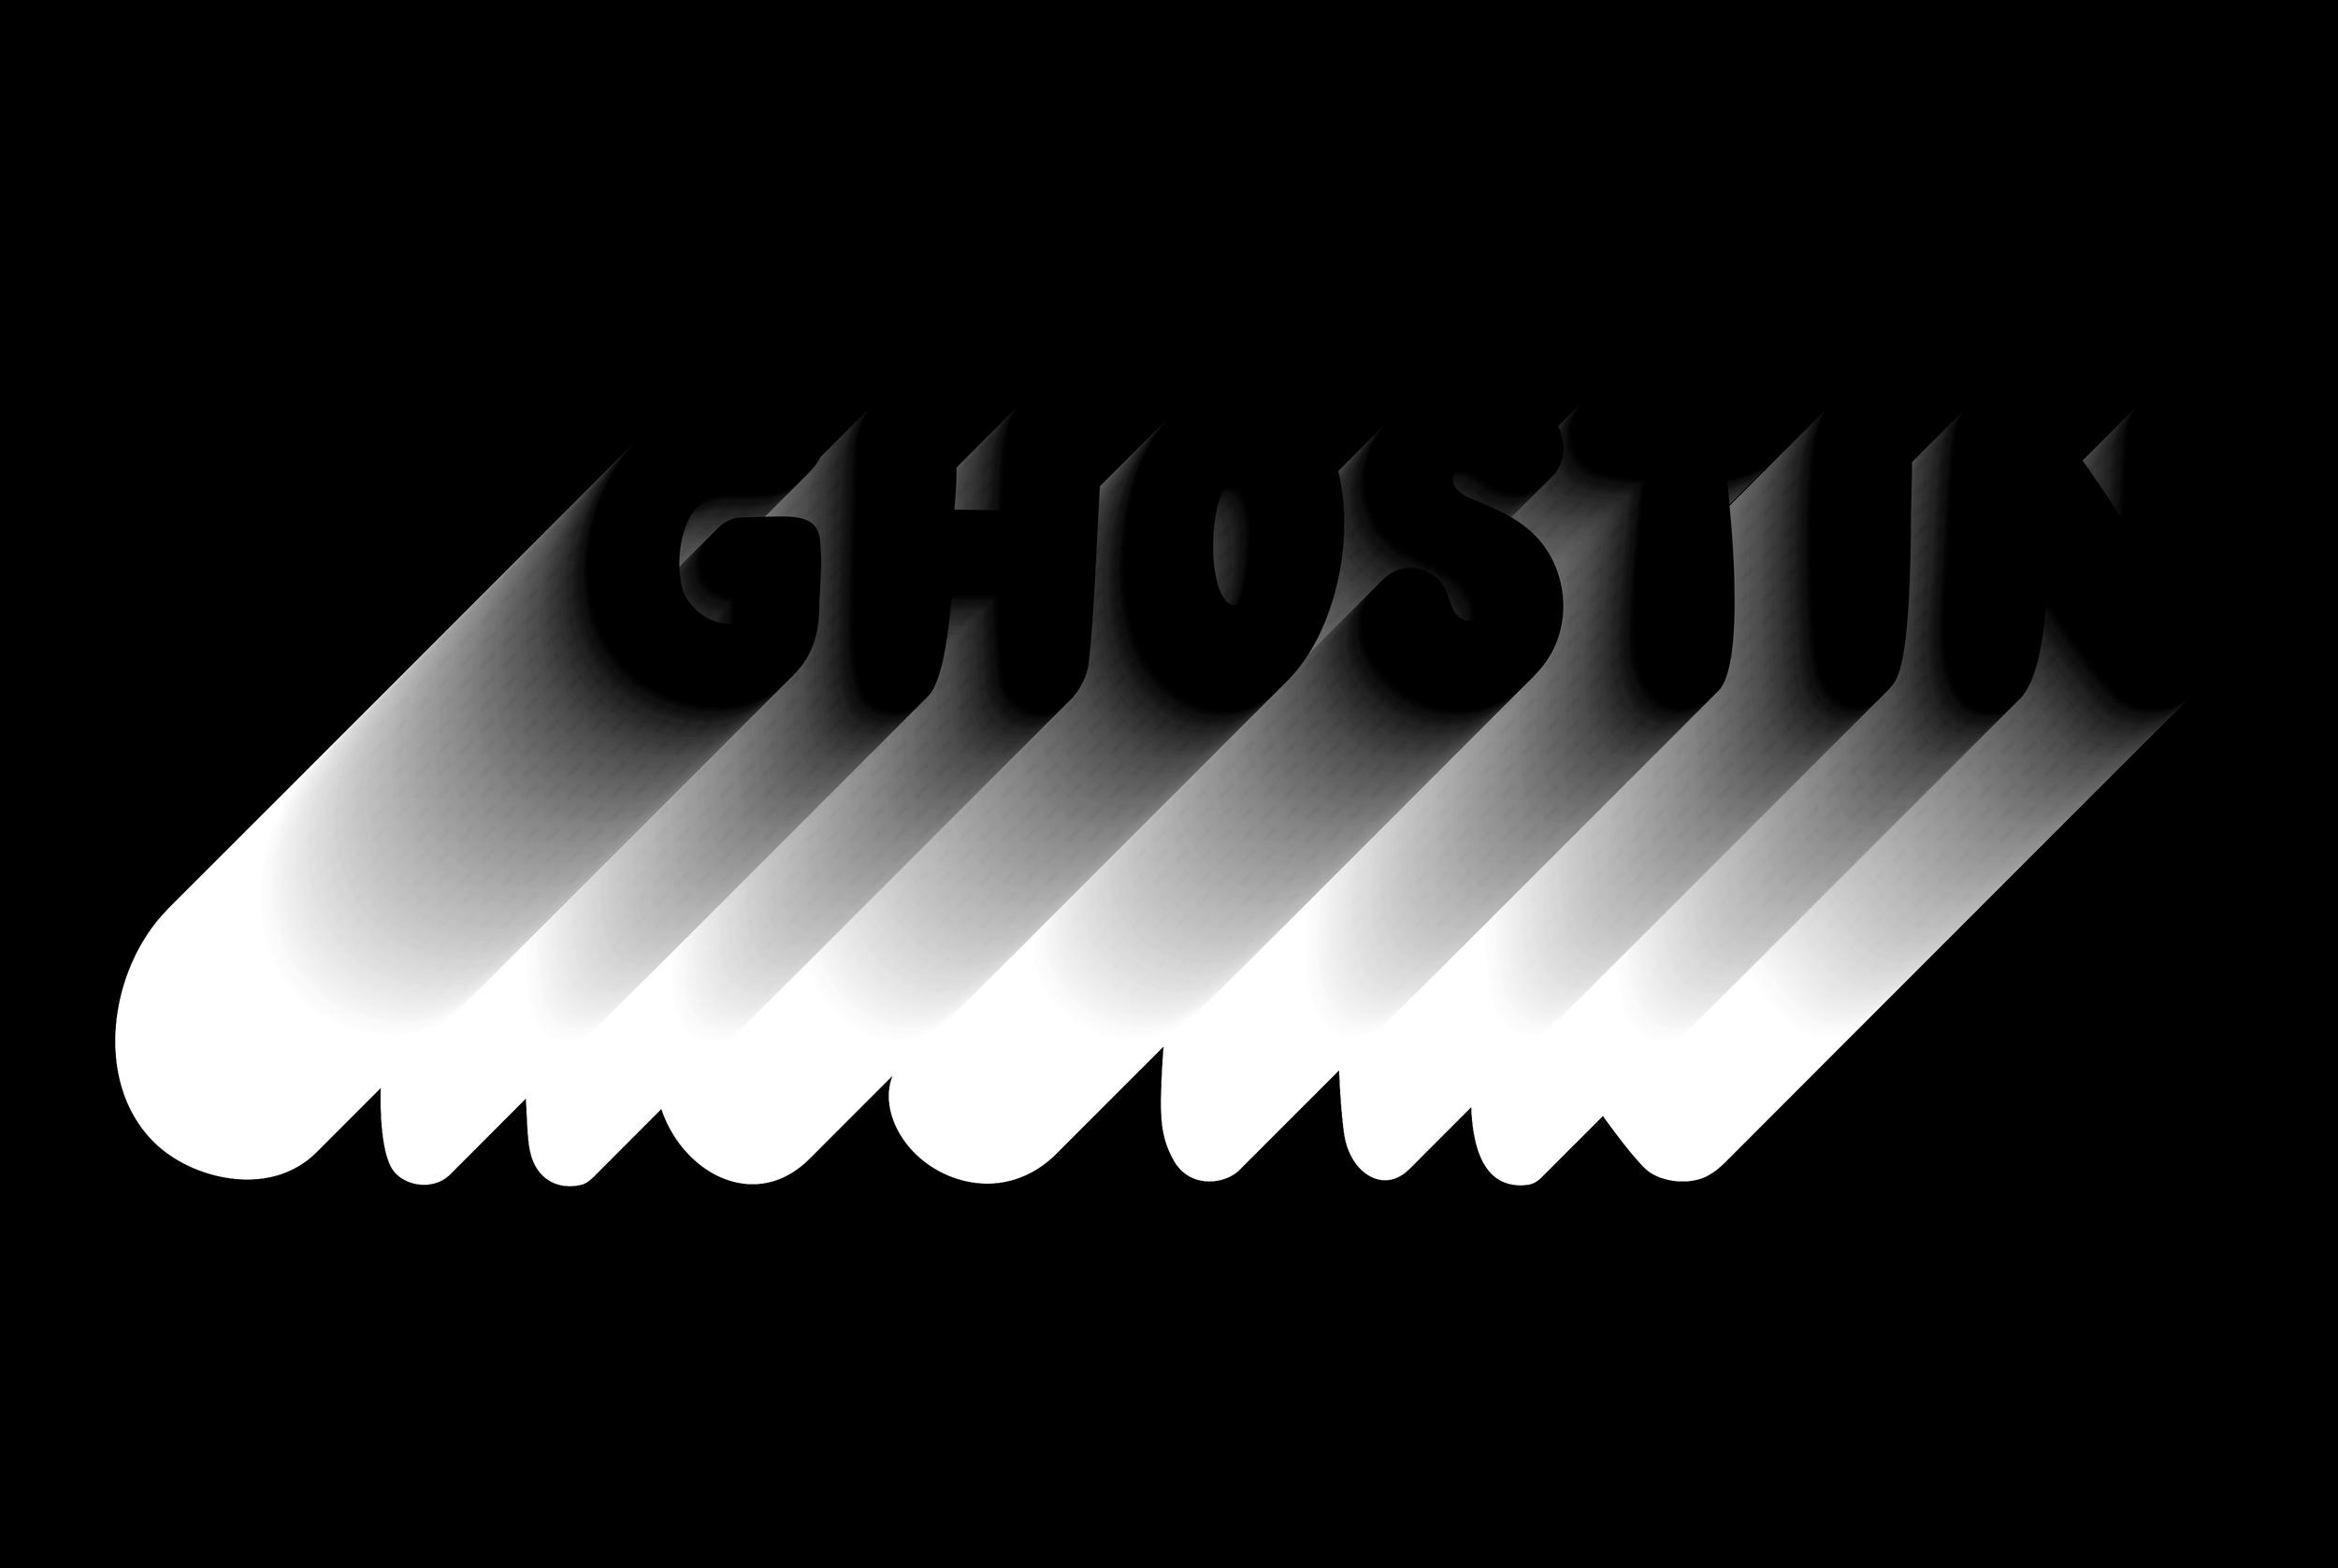 Ghostin.jpg